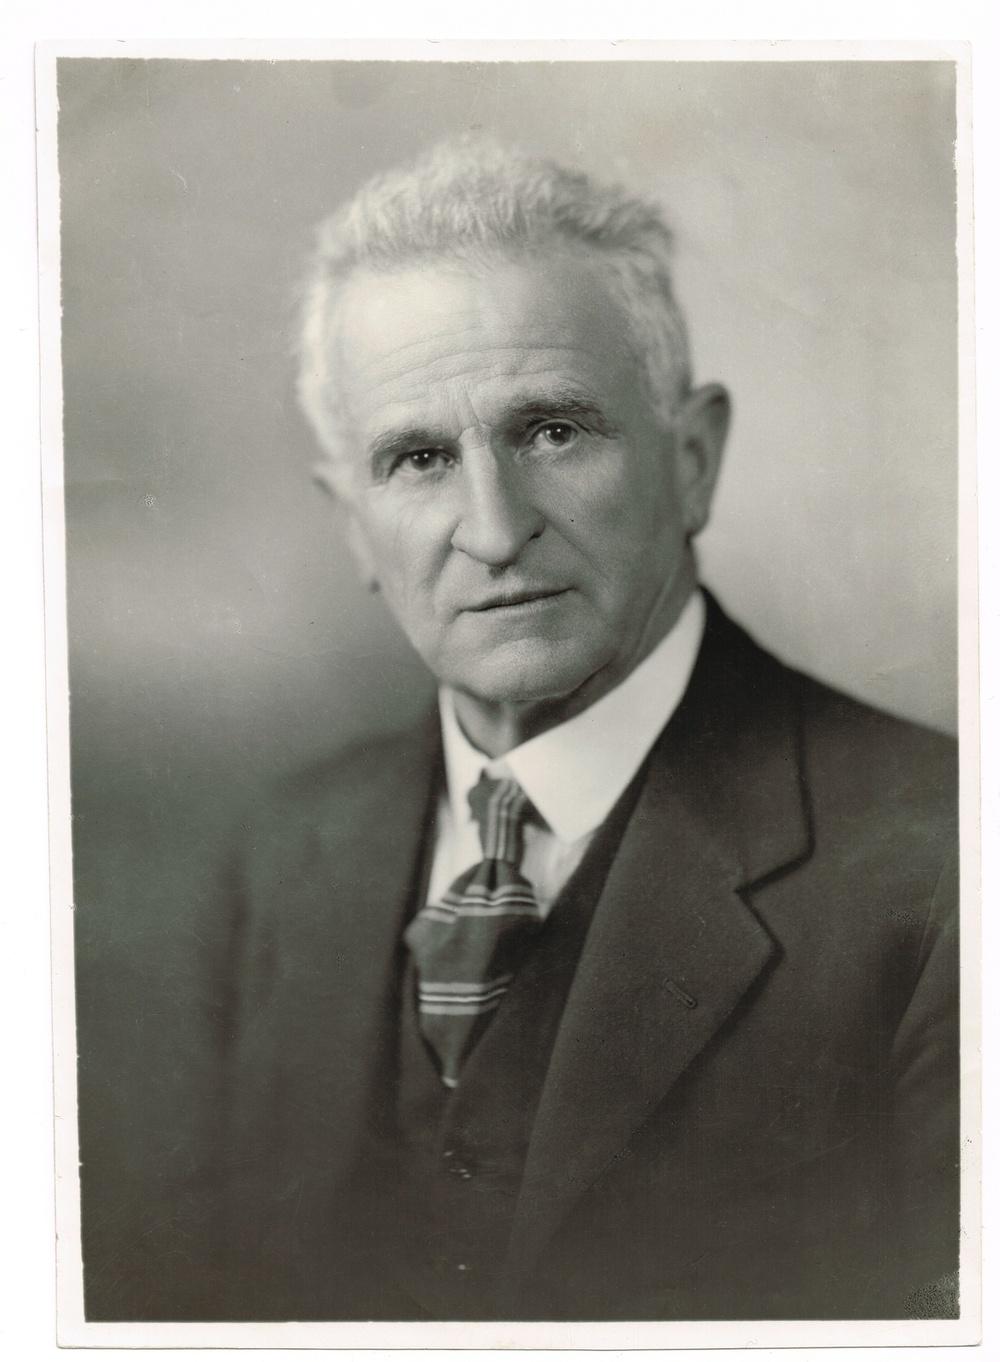 Denis Dease